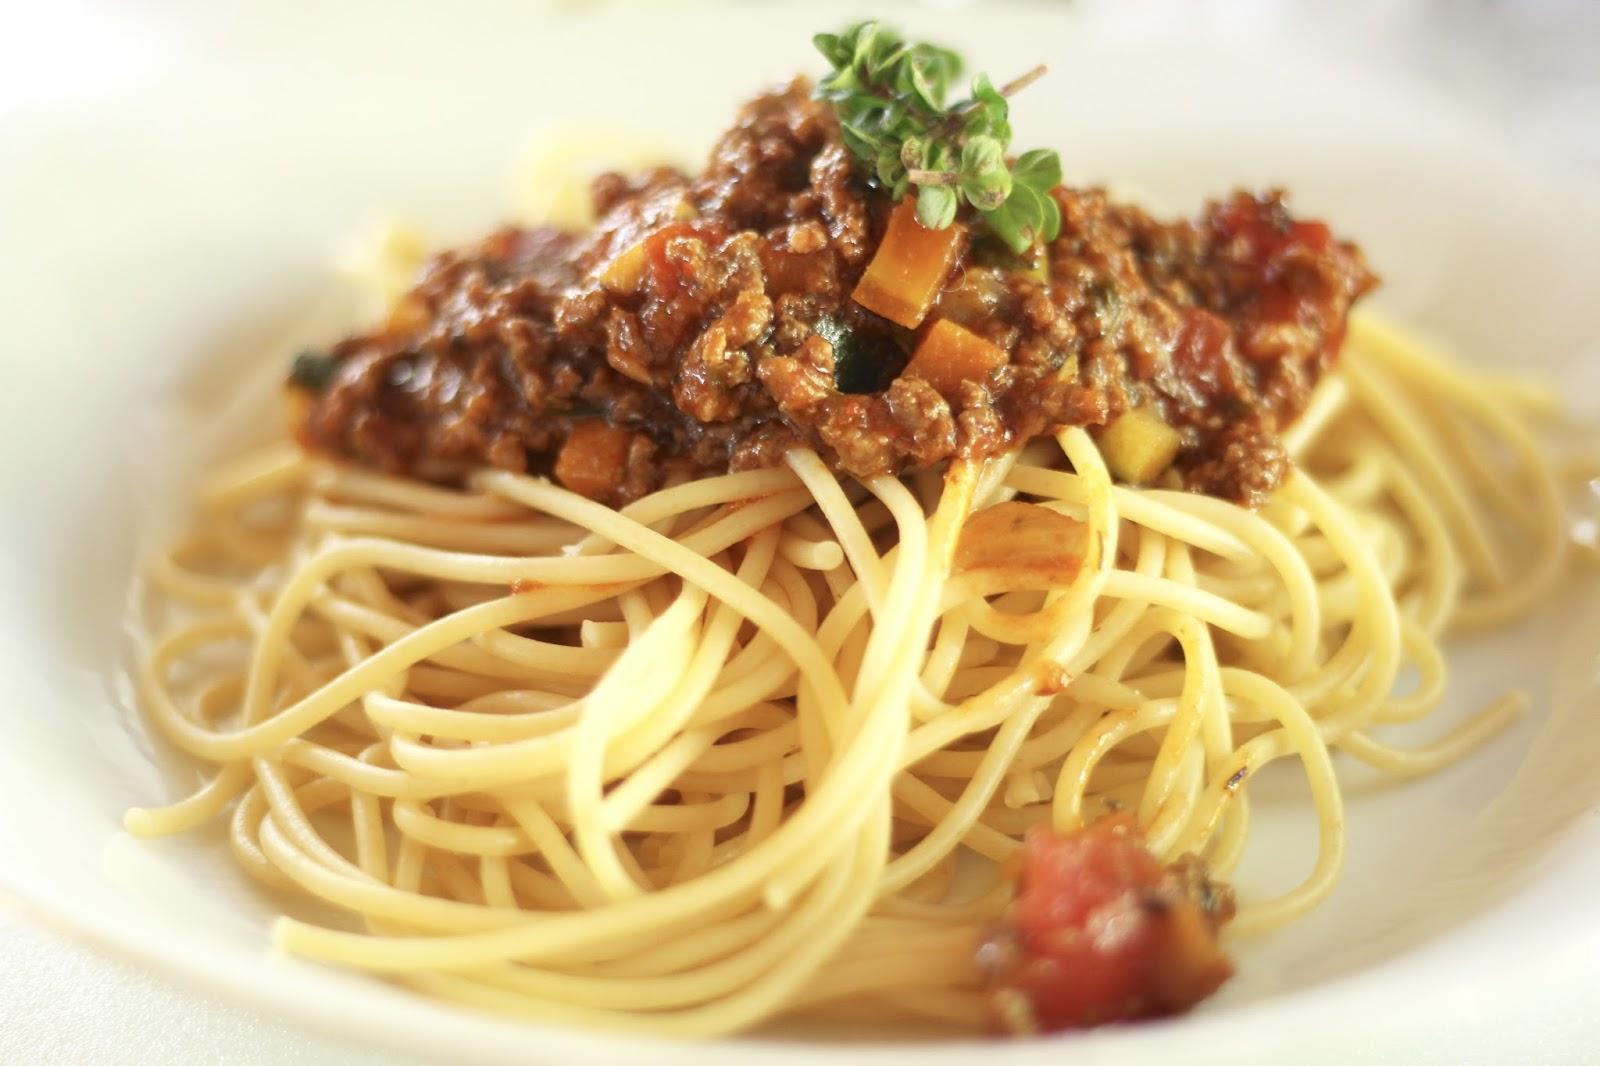 Rezept für leckere Spaghetti Bolognese à la Yushka mit Geheimzutaten: Leserwunsch